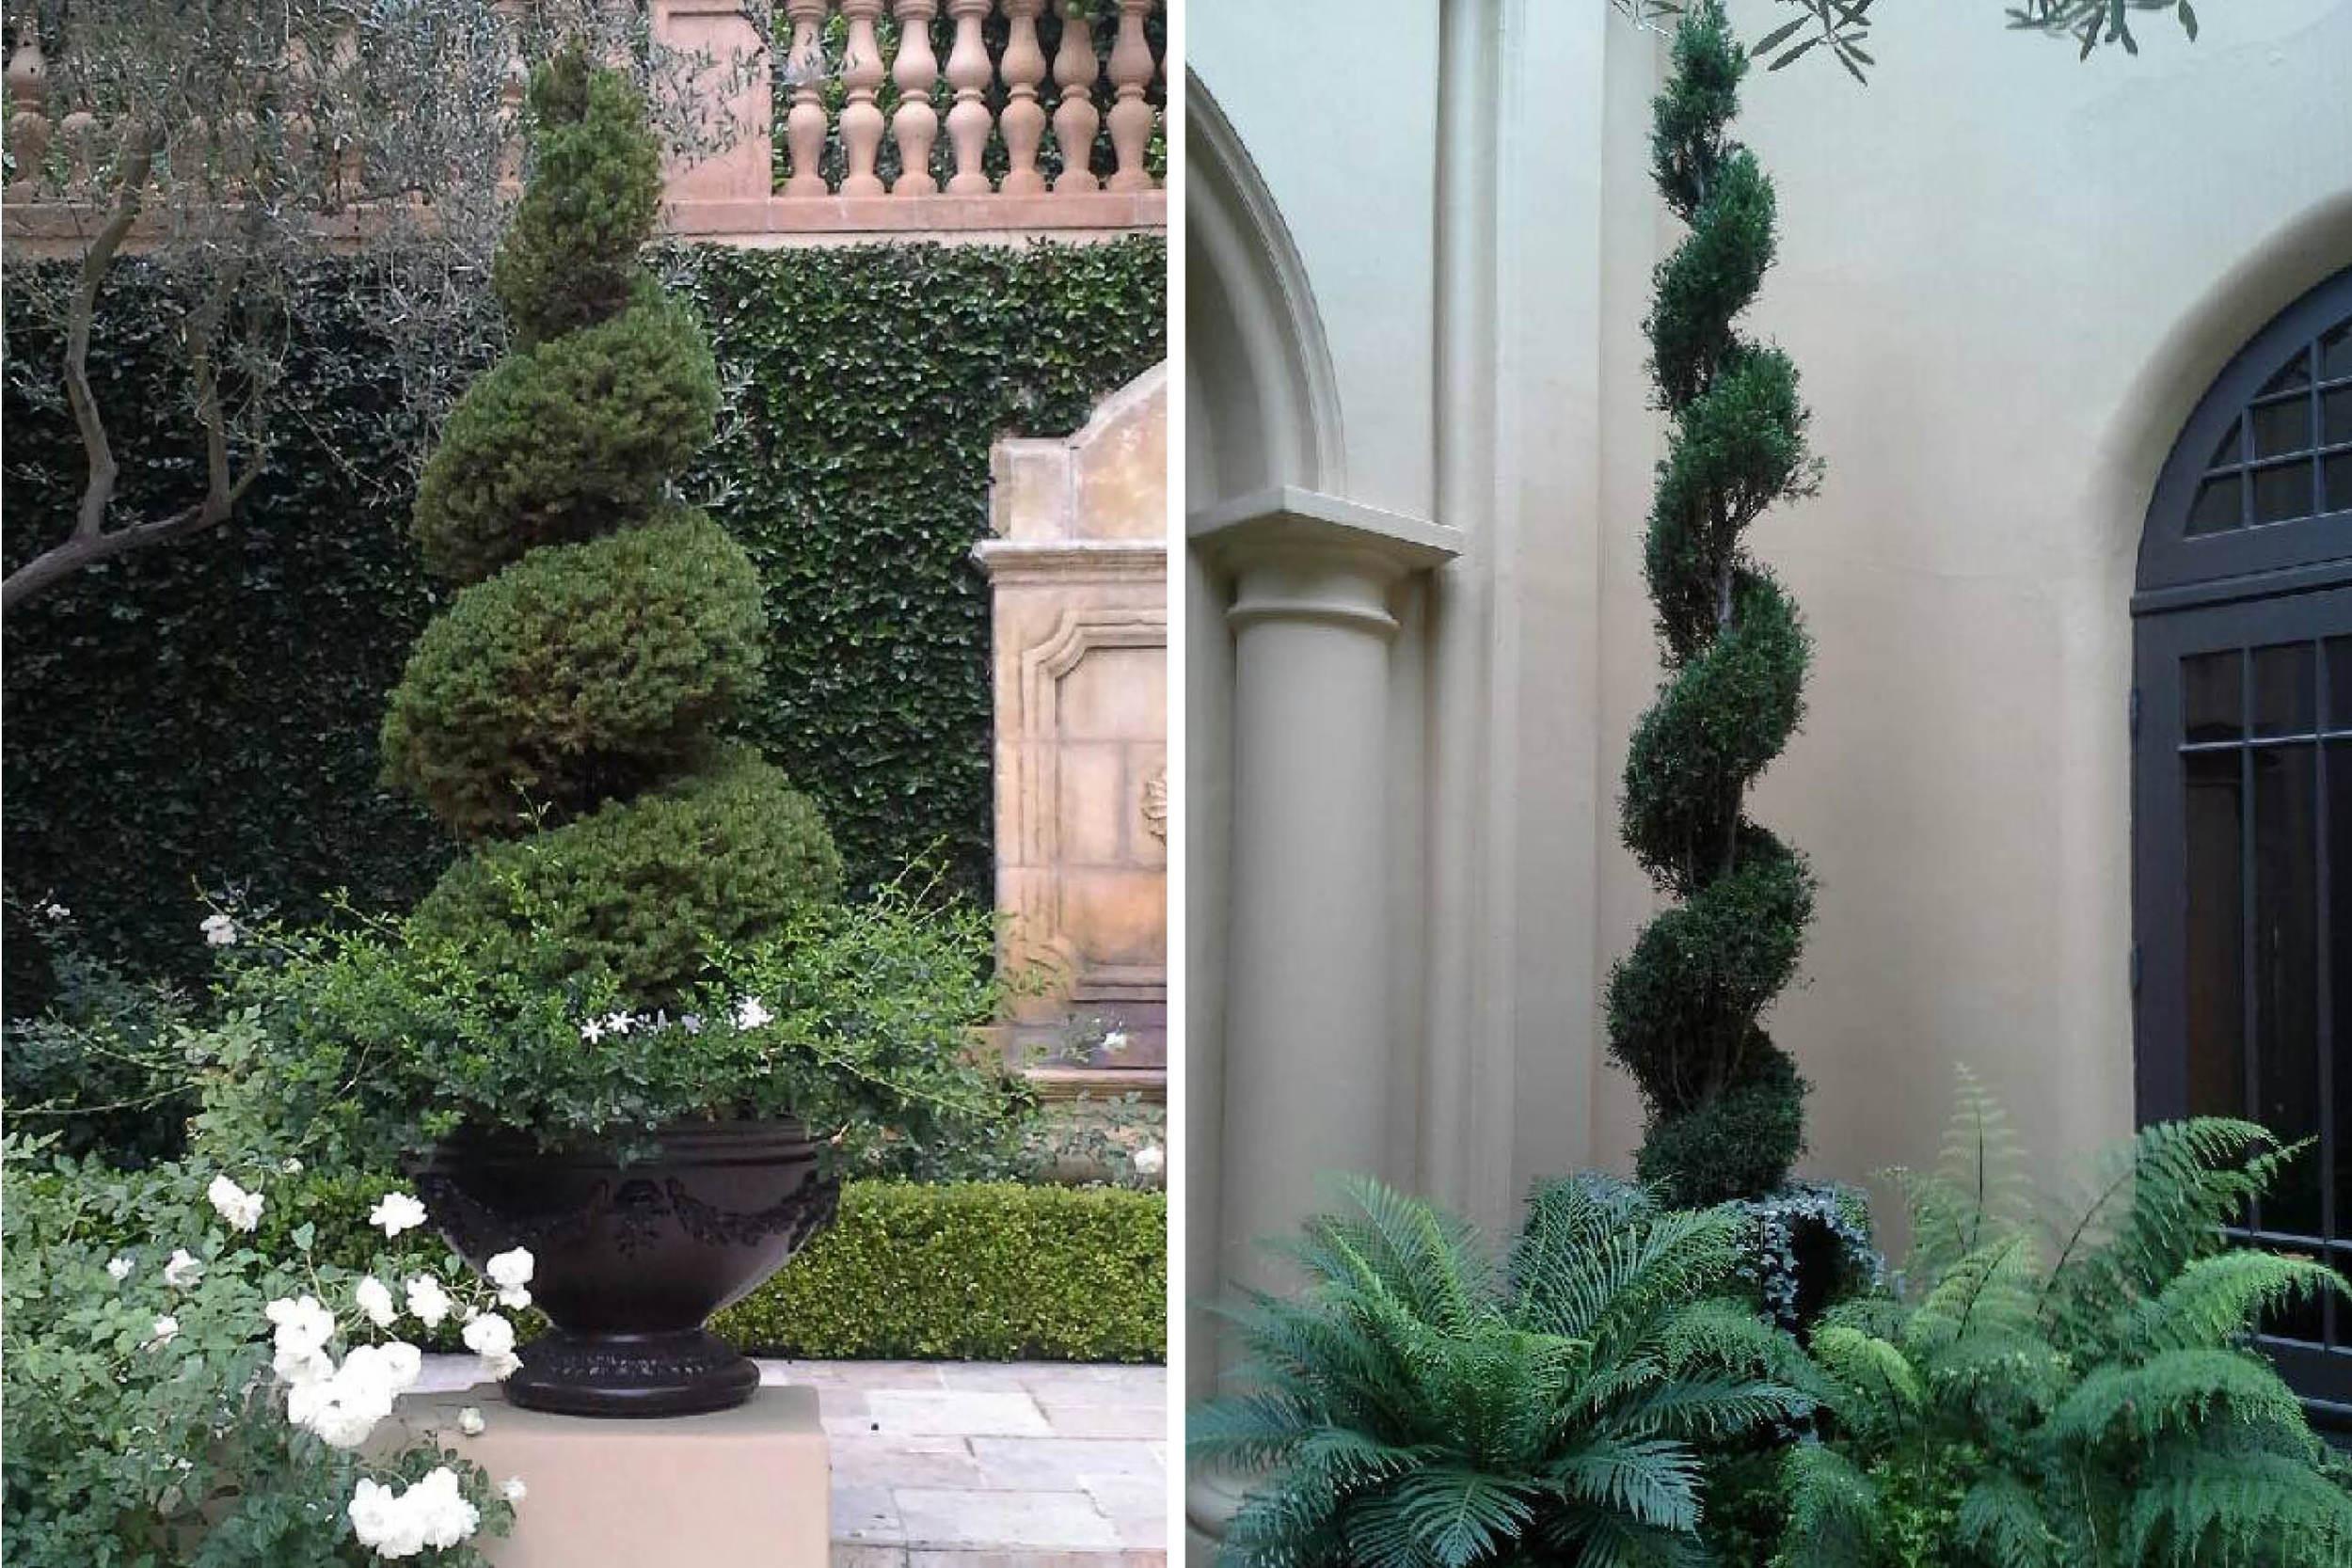 the-village-gardener-home-staging-plants-patio-decor-maintenance-interior-orchids-santa-barbara-carpinteria-losangeles-pasadena-santaynez  (2).jpg